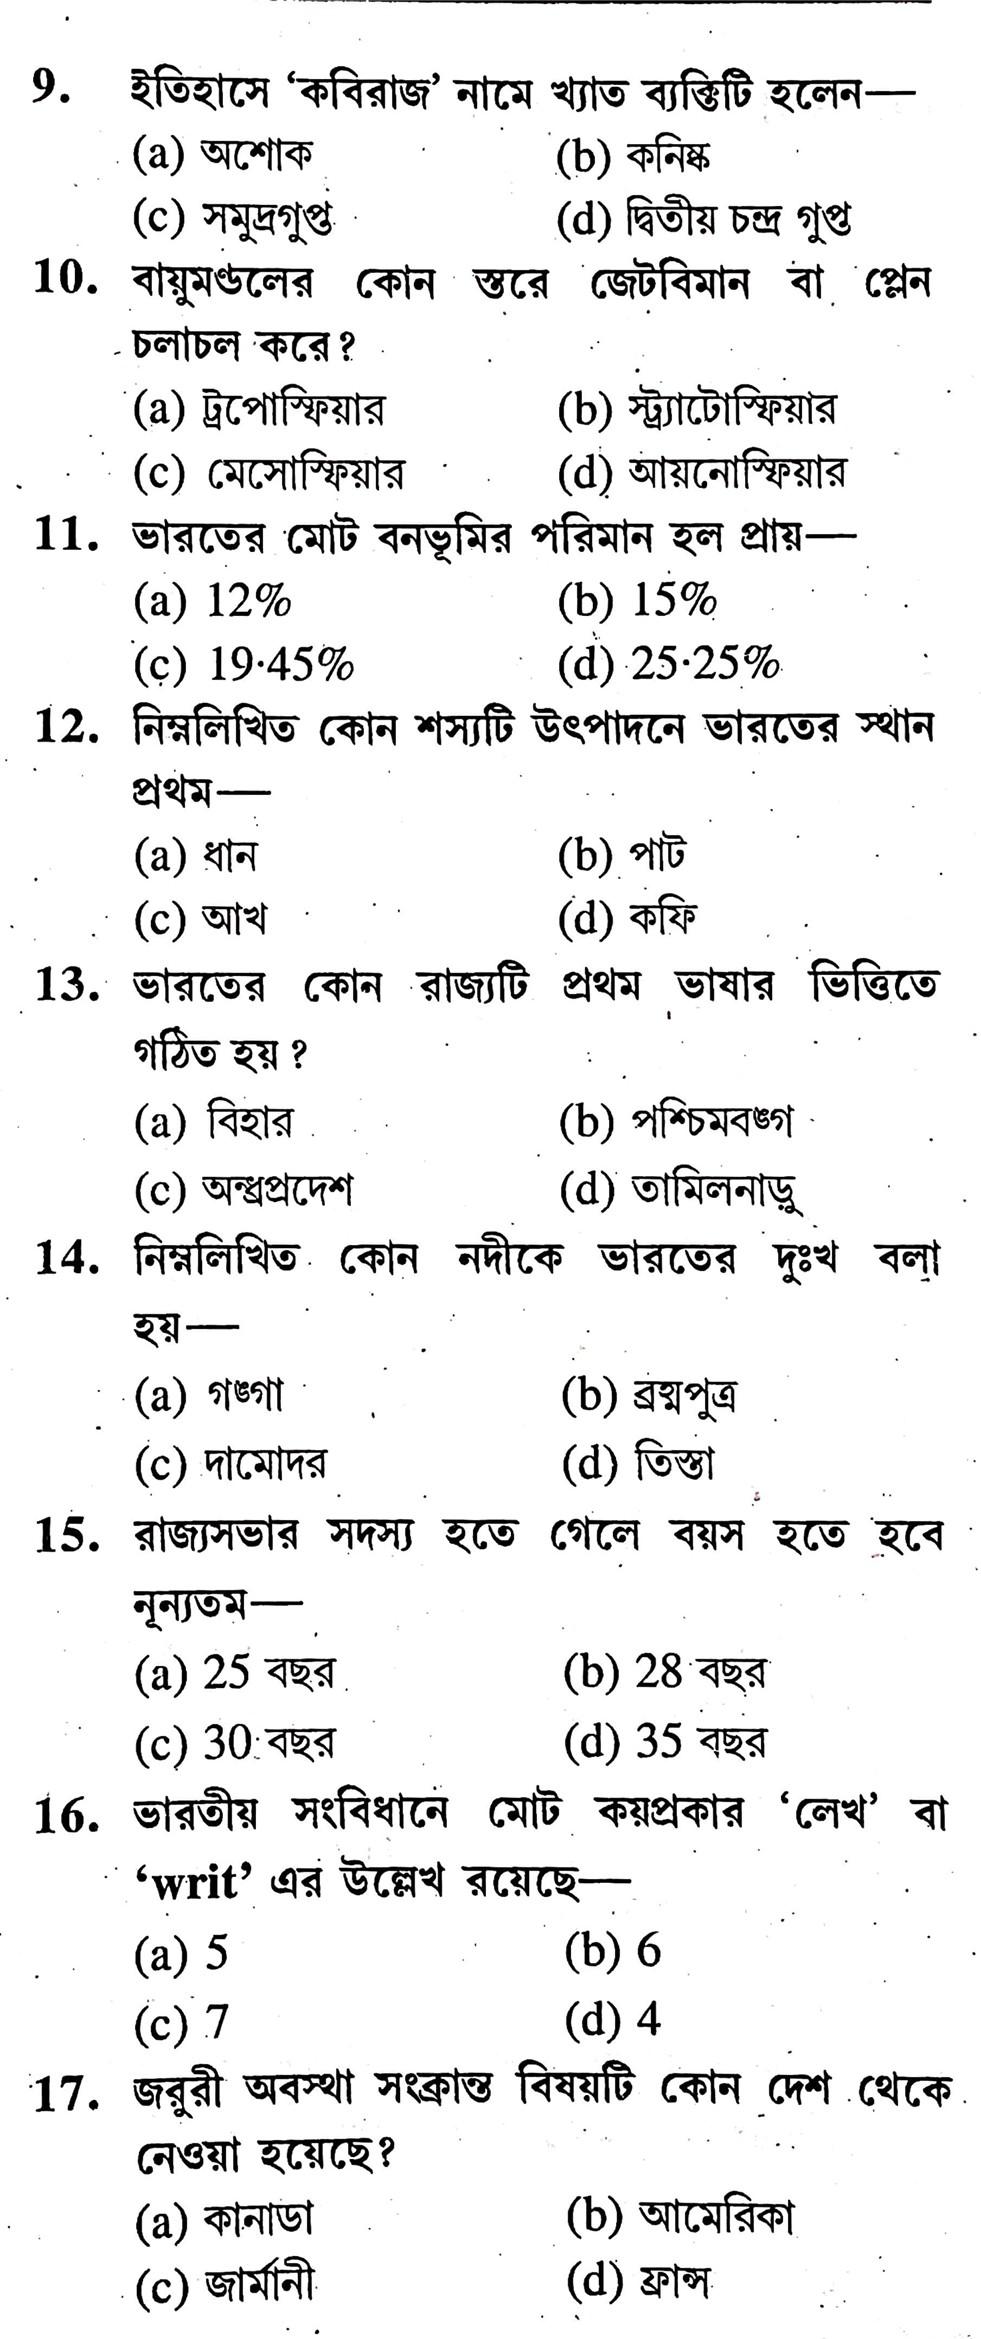 West Bengal Police Constable Preliminary Practice Set -8 In Bengali    পশ্চিমবঙ্গ পুলিশ কনস্টেবল প্রিলিমিনারী প্র্যাকটিস সেট -৮